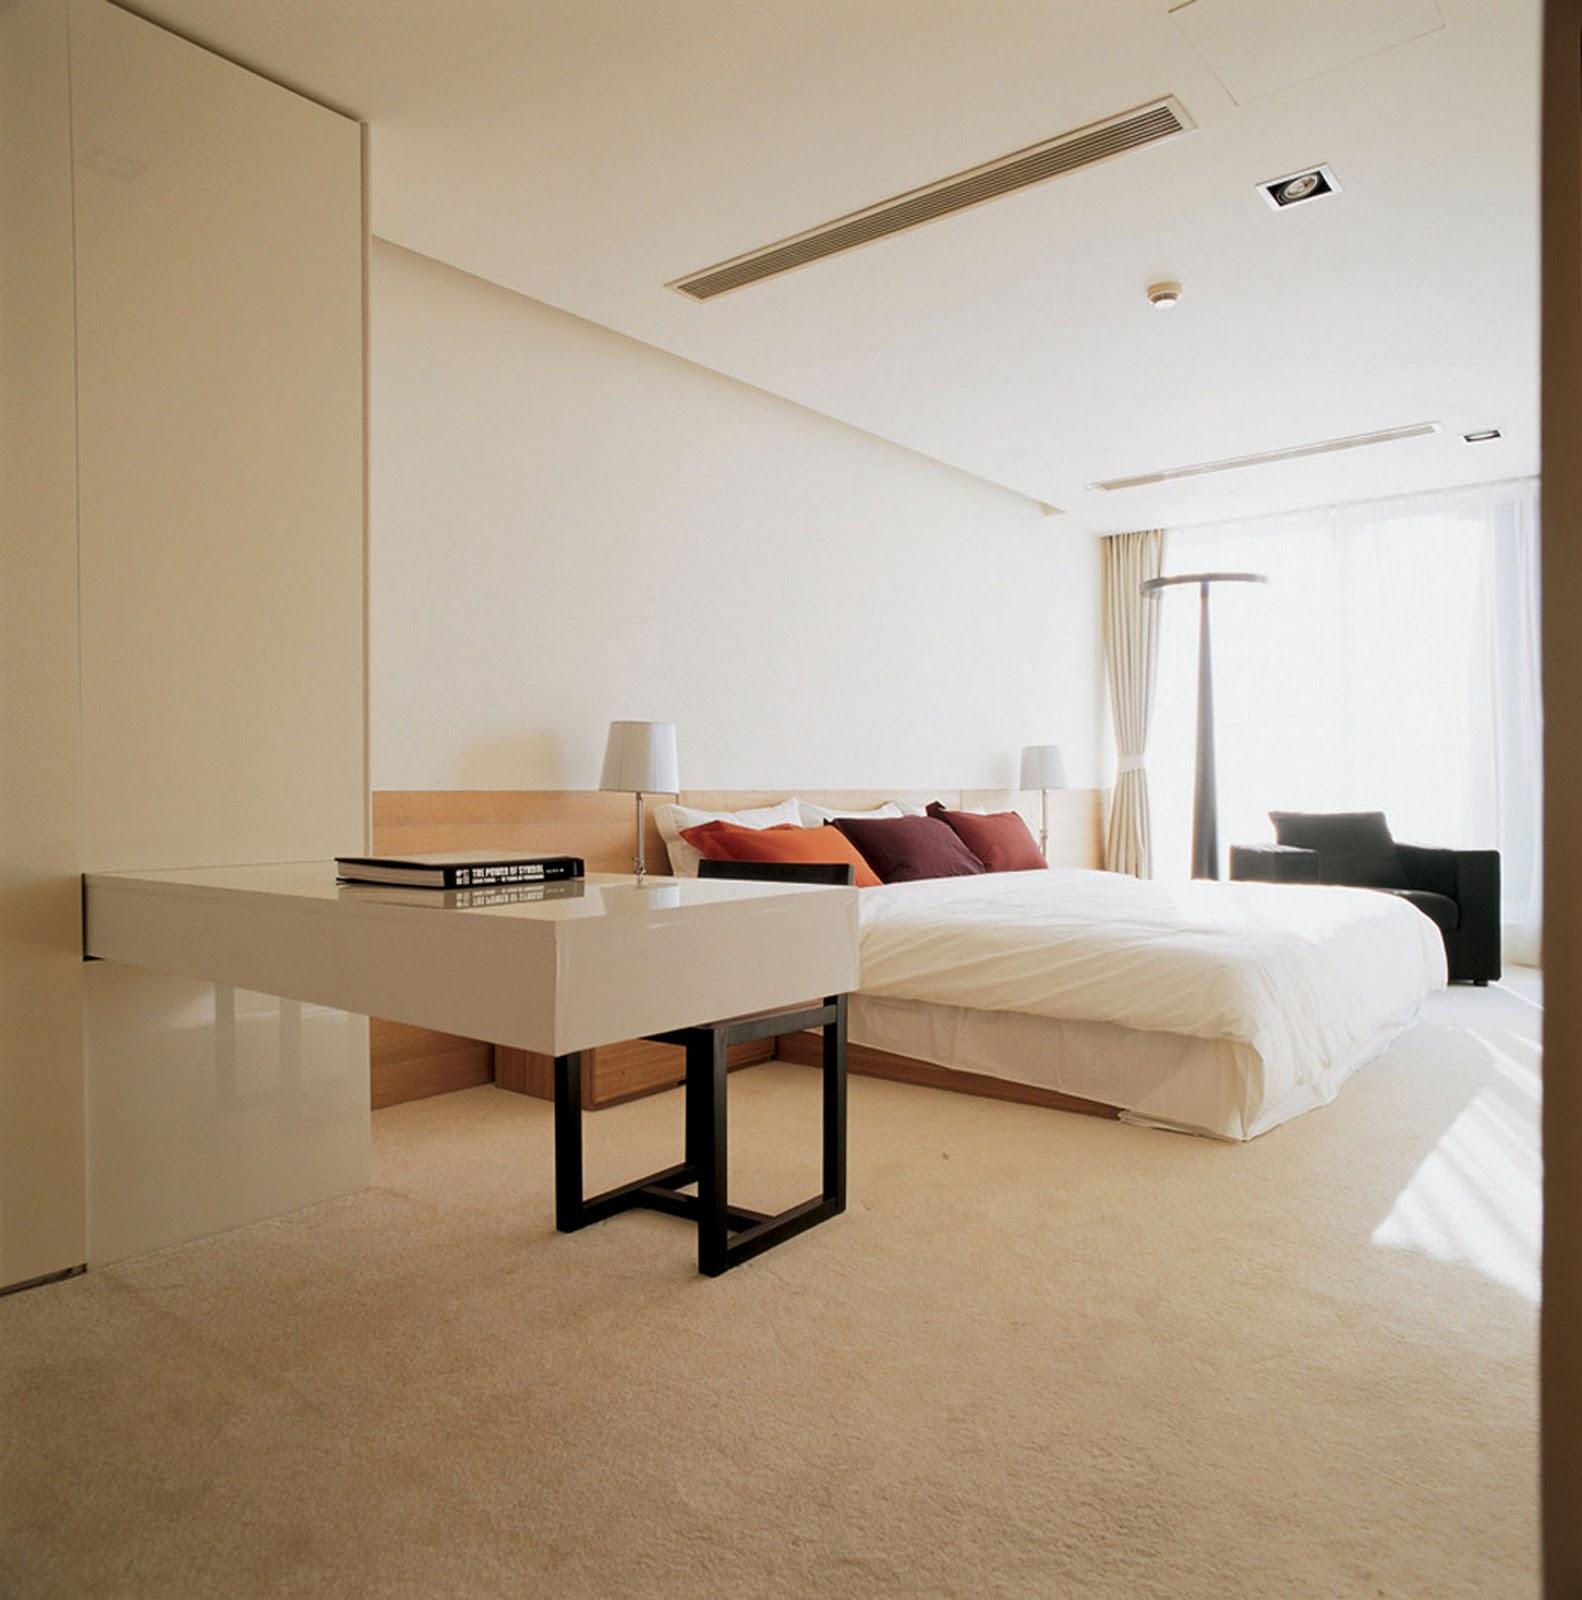 Simple Kitchen Meaning: SOHO Interior Design   SOHO Beijing Residence    Beijing   China   Ministry Of Design